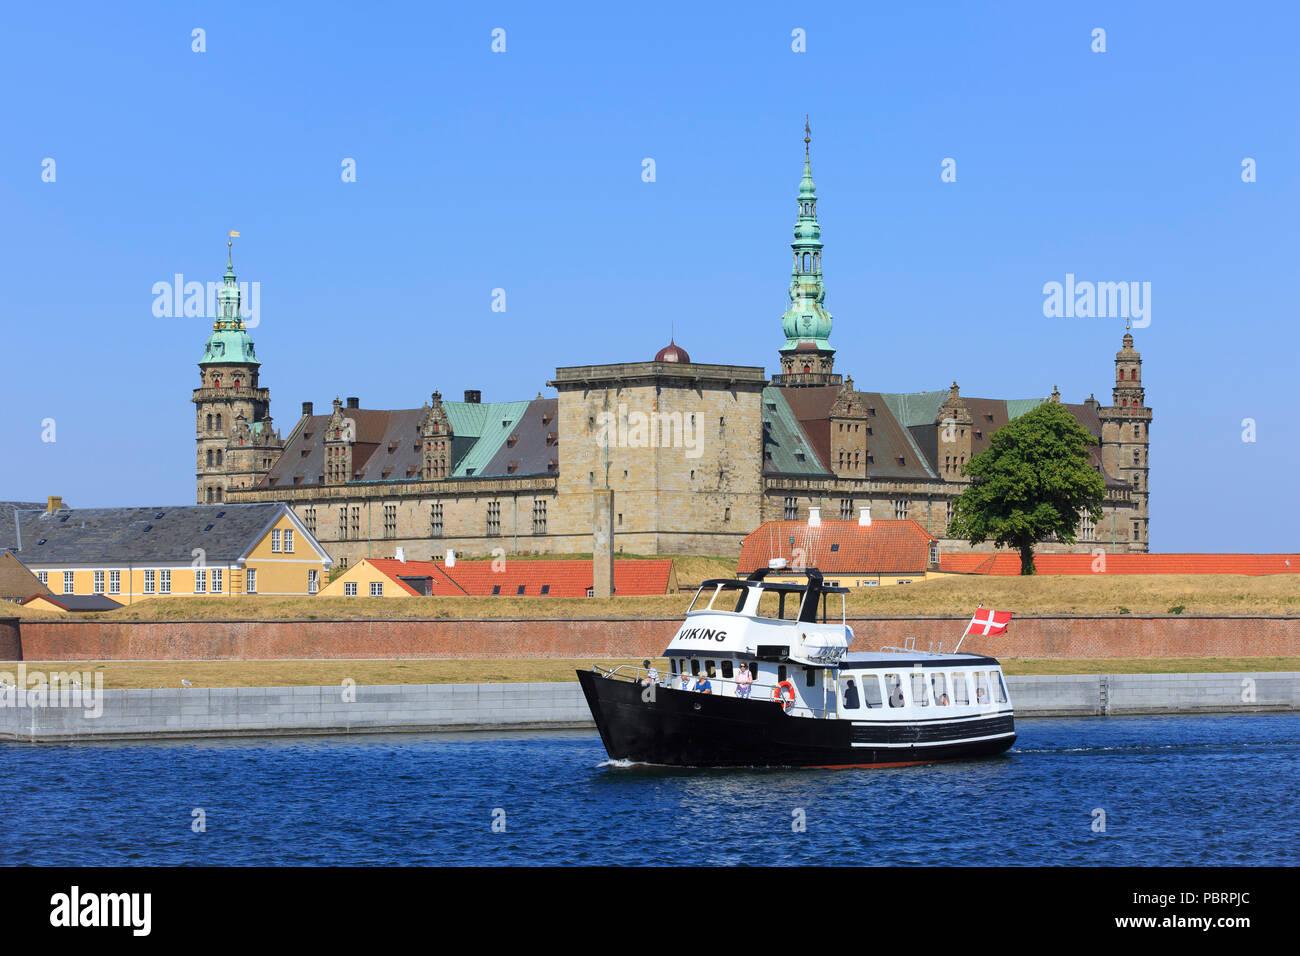 Kronborg Castle (a UNESCO World Heritage Site since 2000) in Helsingor, Denmark - Stock Image